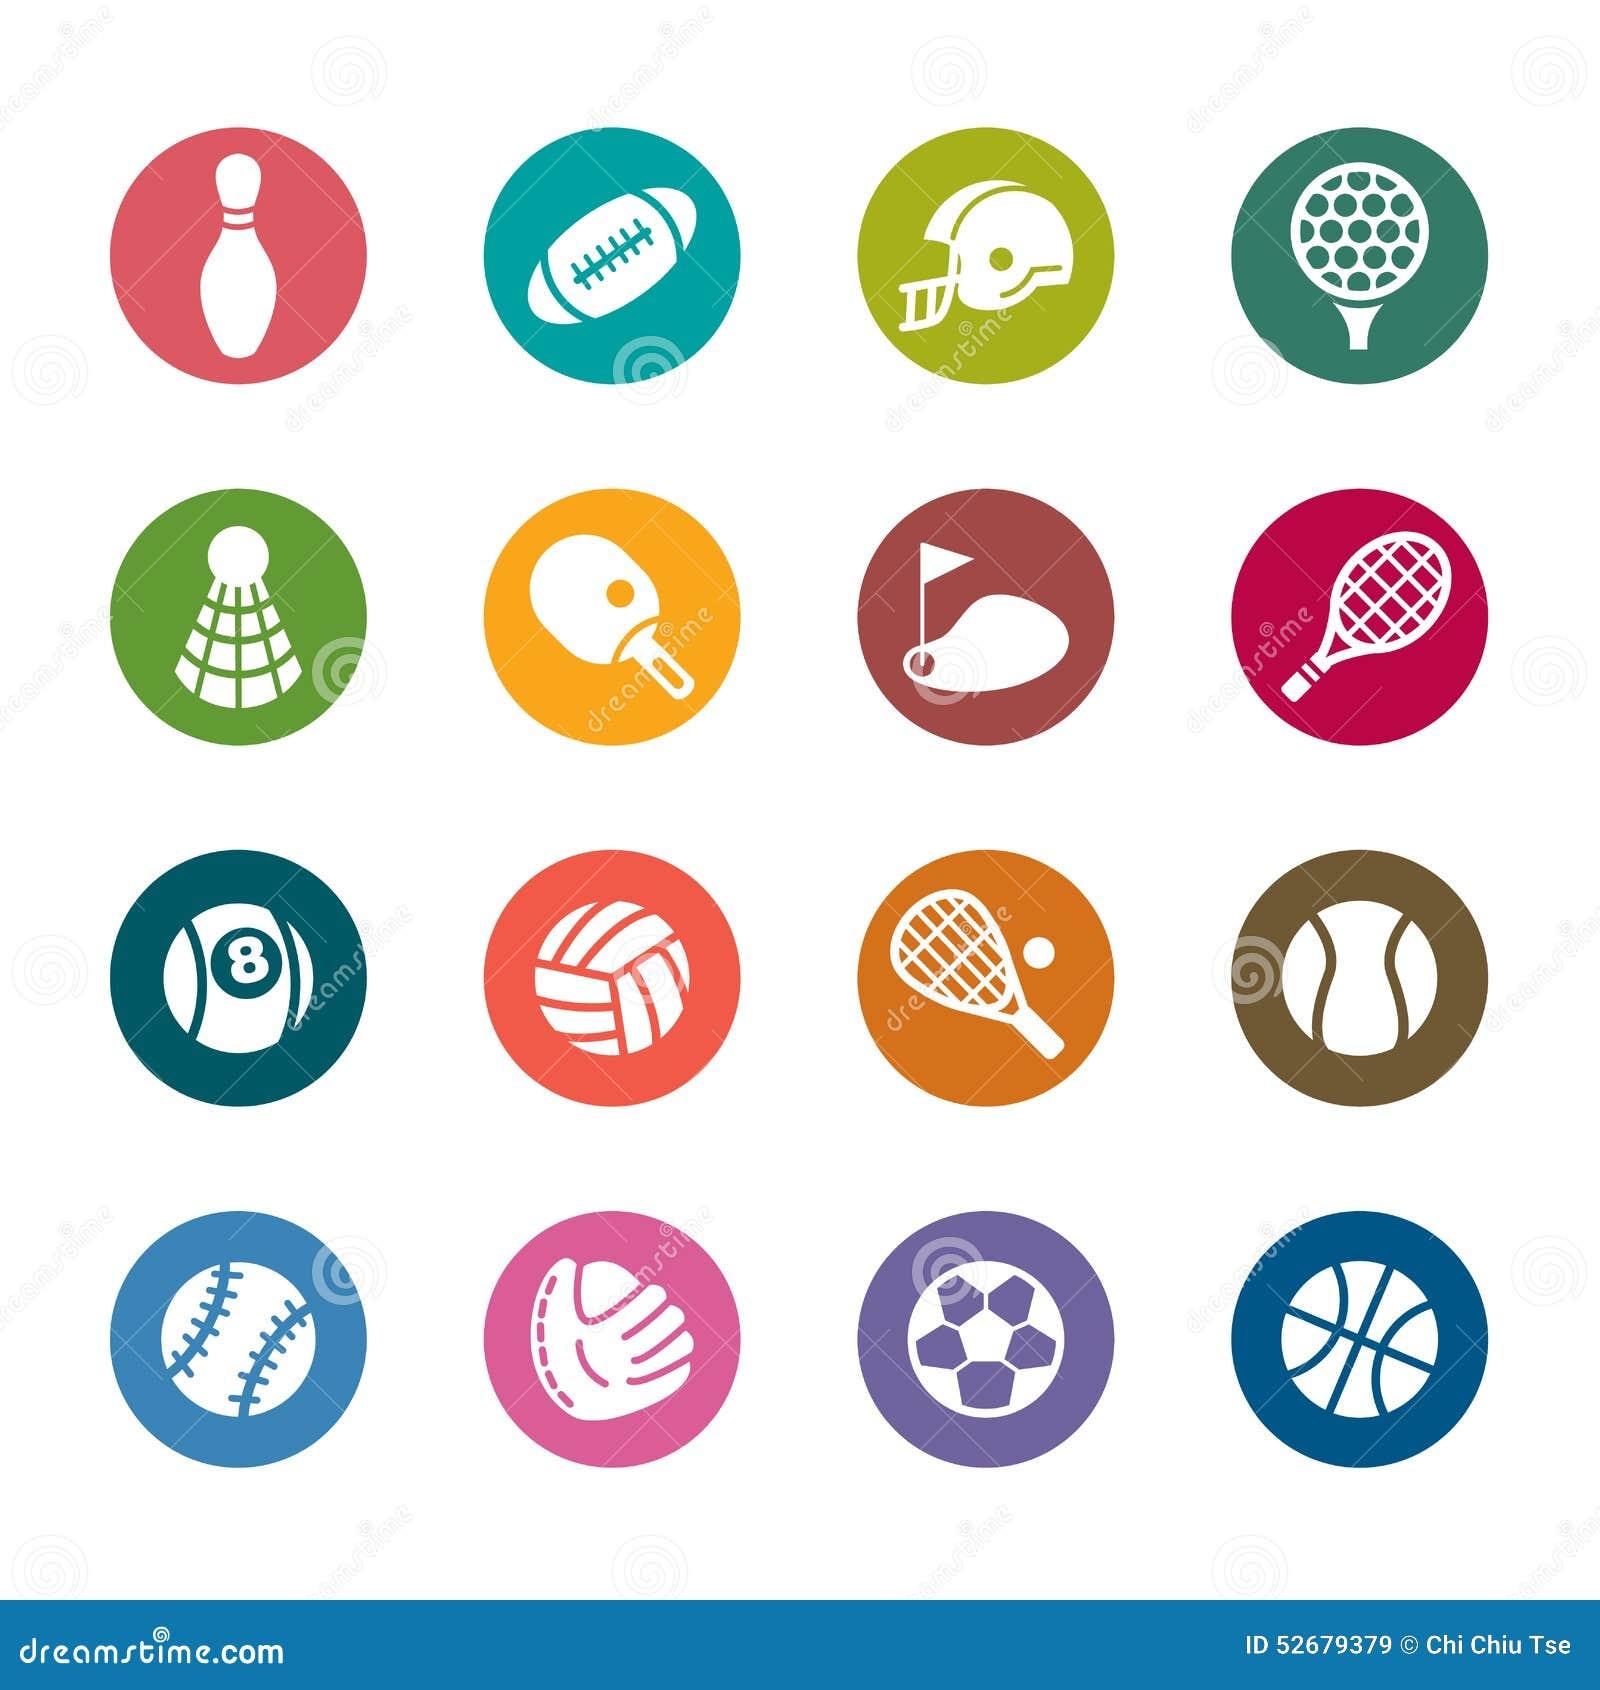 Sport Color Icons stock illustration. Illustration of digitally ...